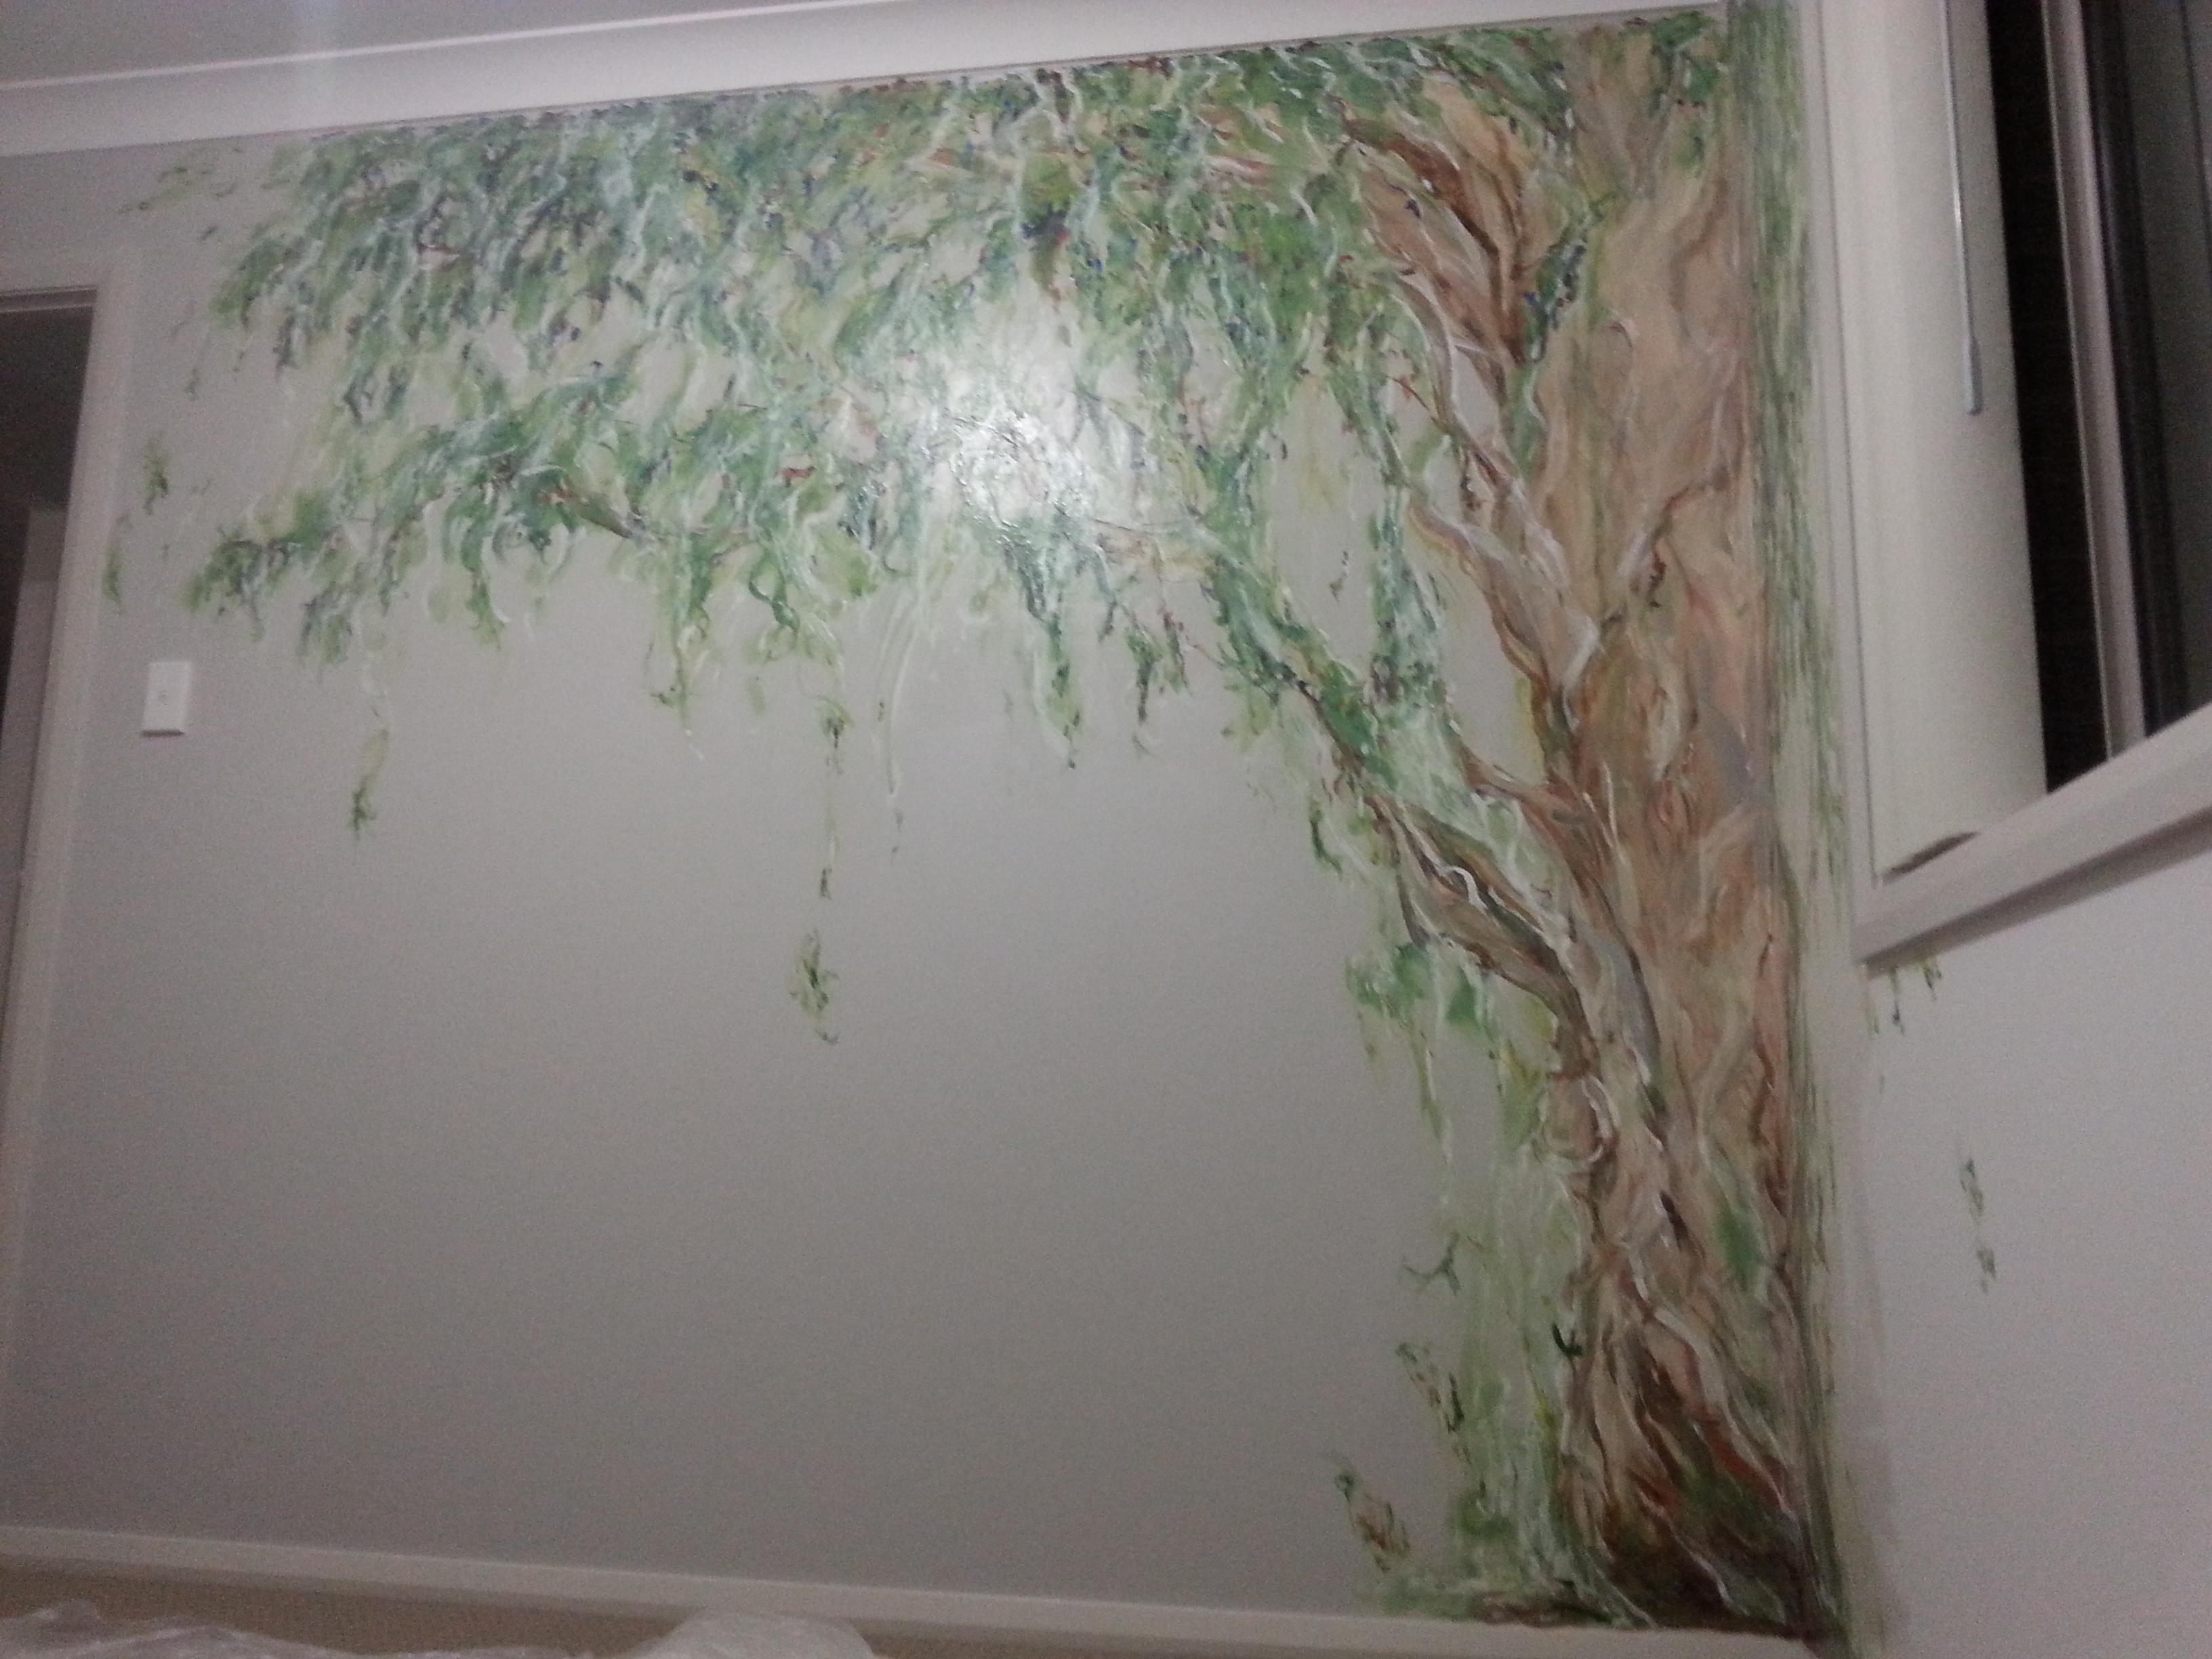 Mural of Tree